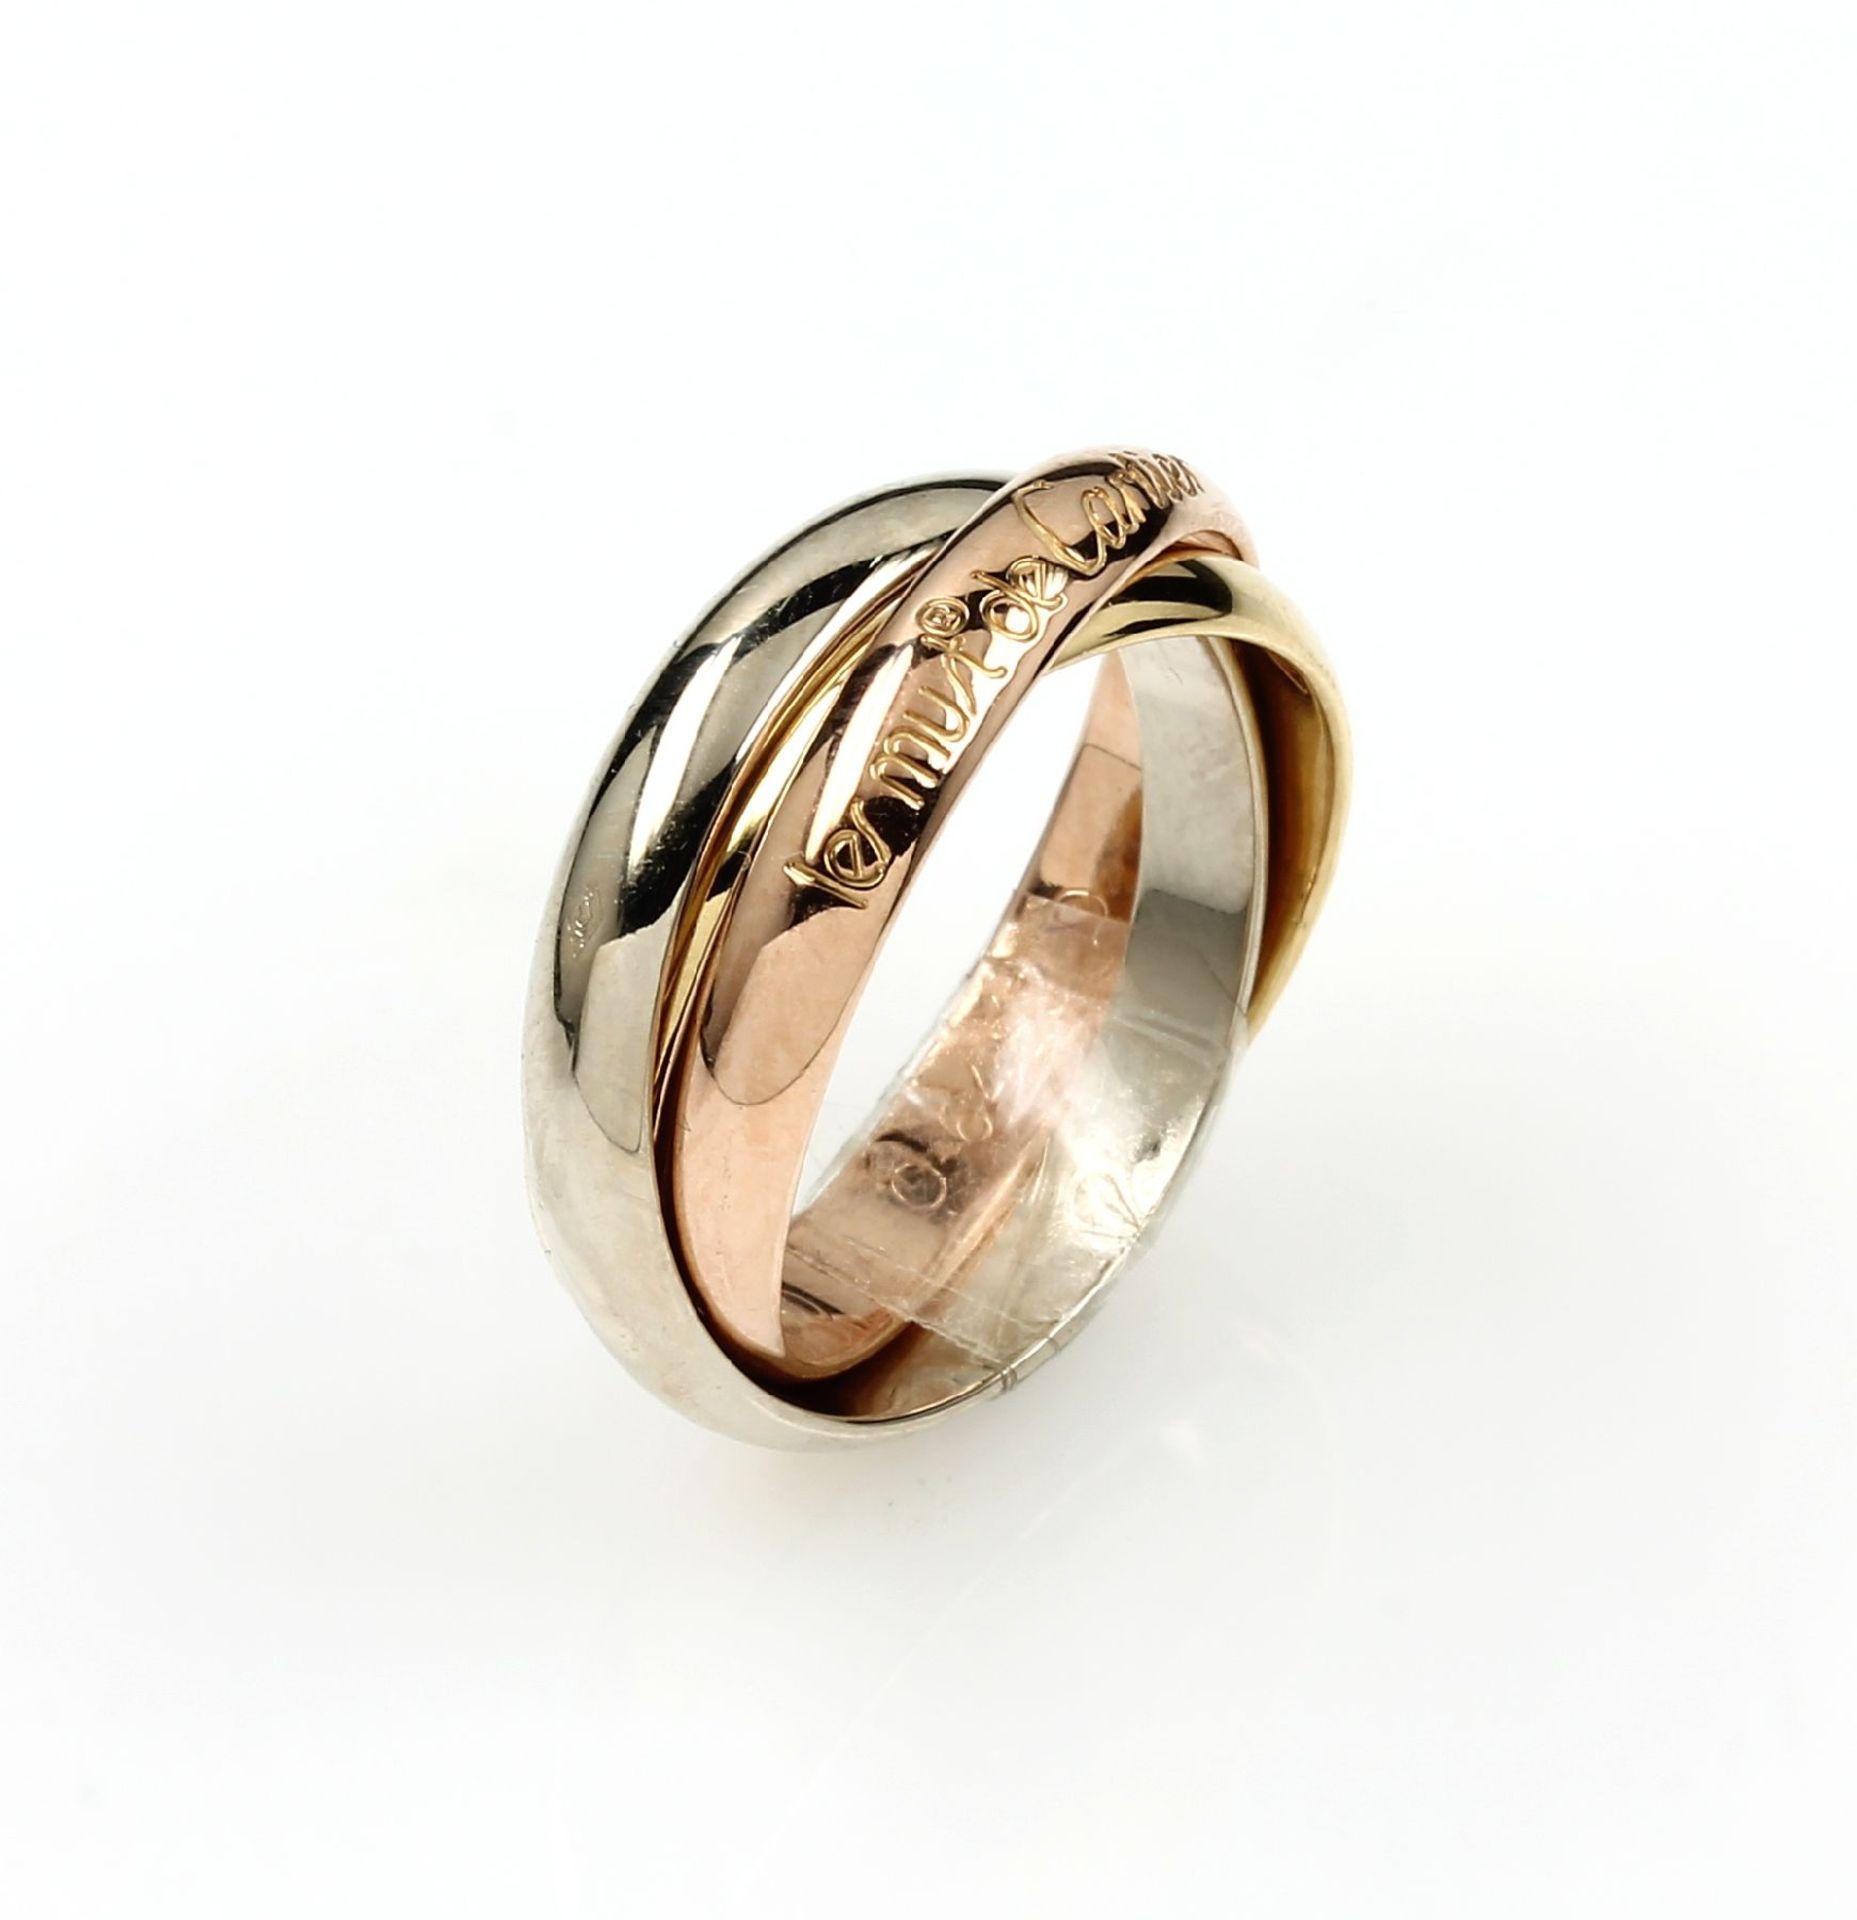 Los 61547 - 18 kt gold Le Must de CARTIER Trinity ring ,YG/WG/RoseG 750/000, classic Trinity design, signed